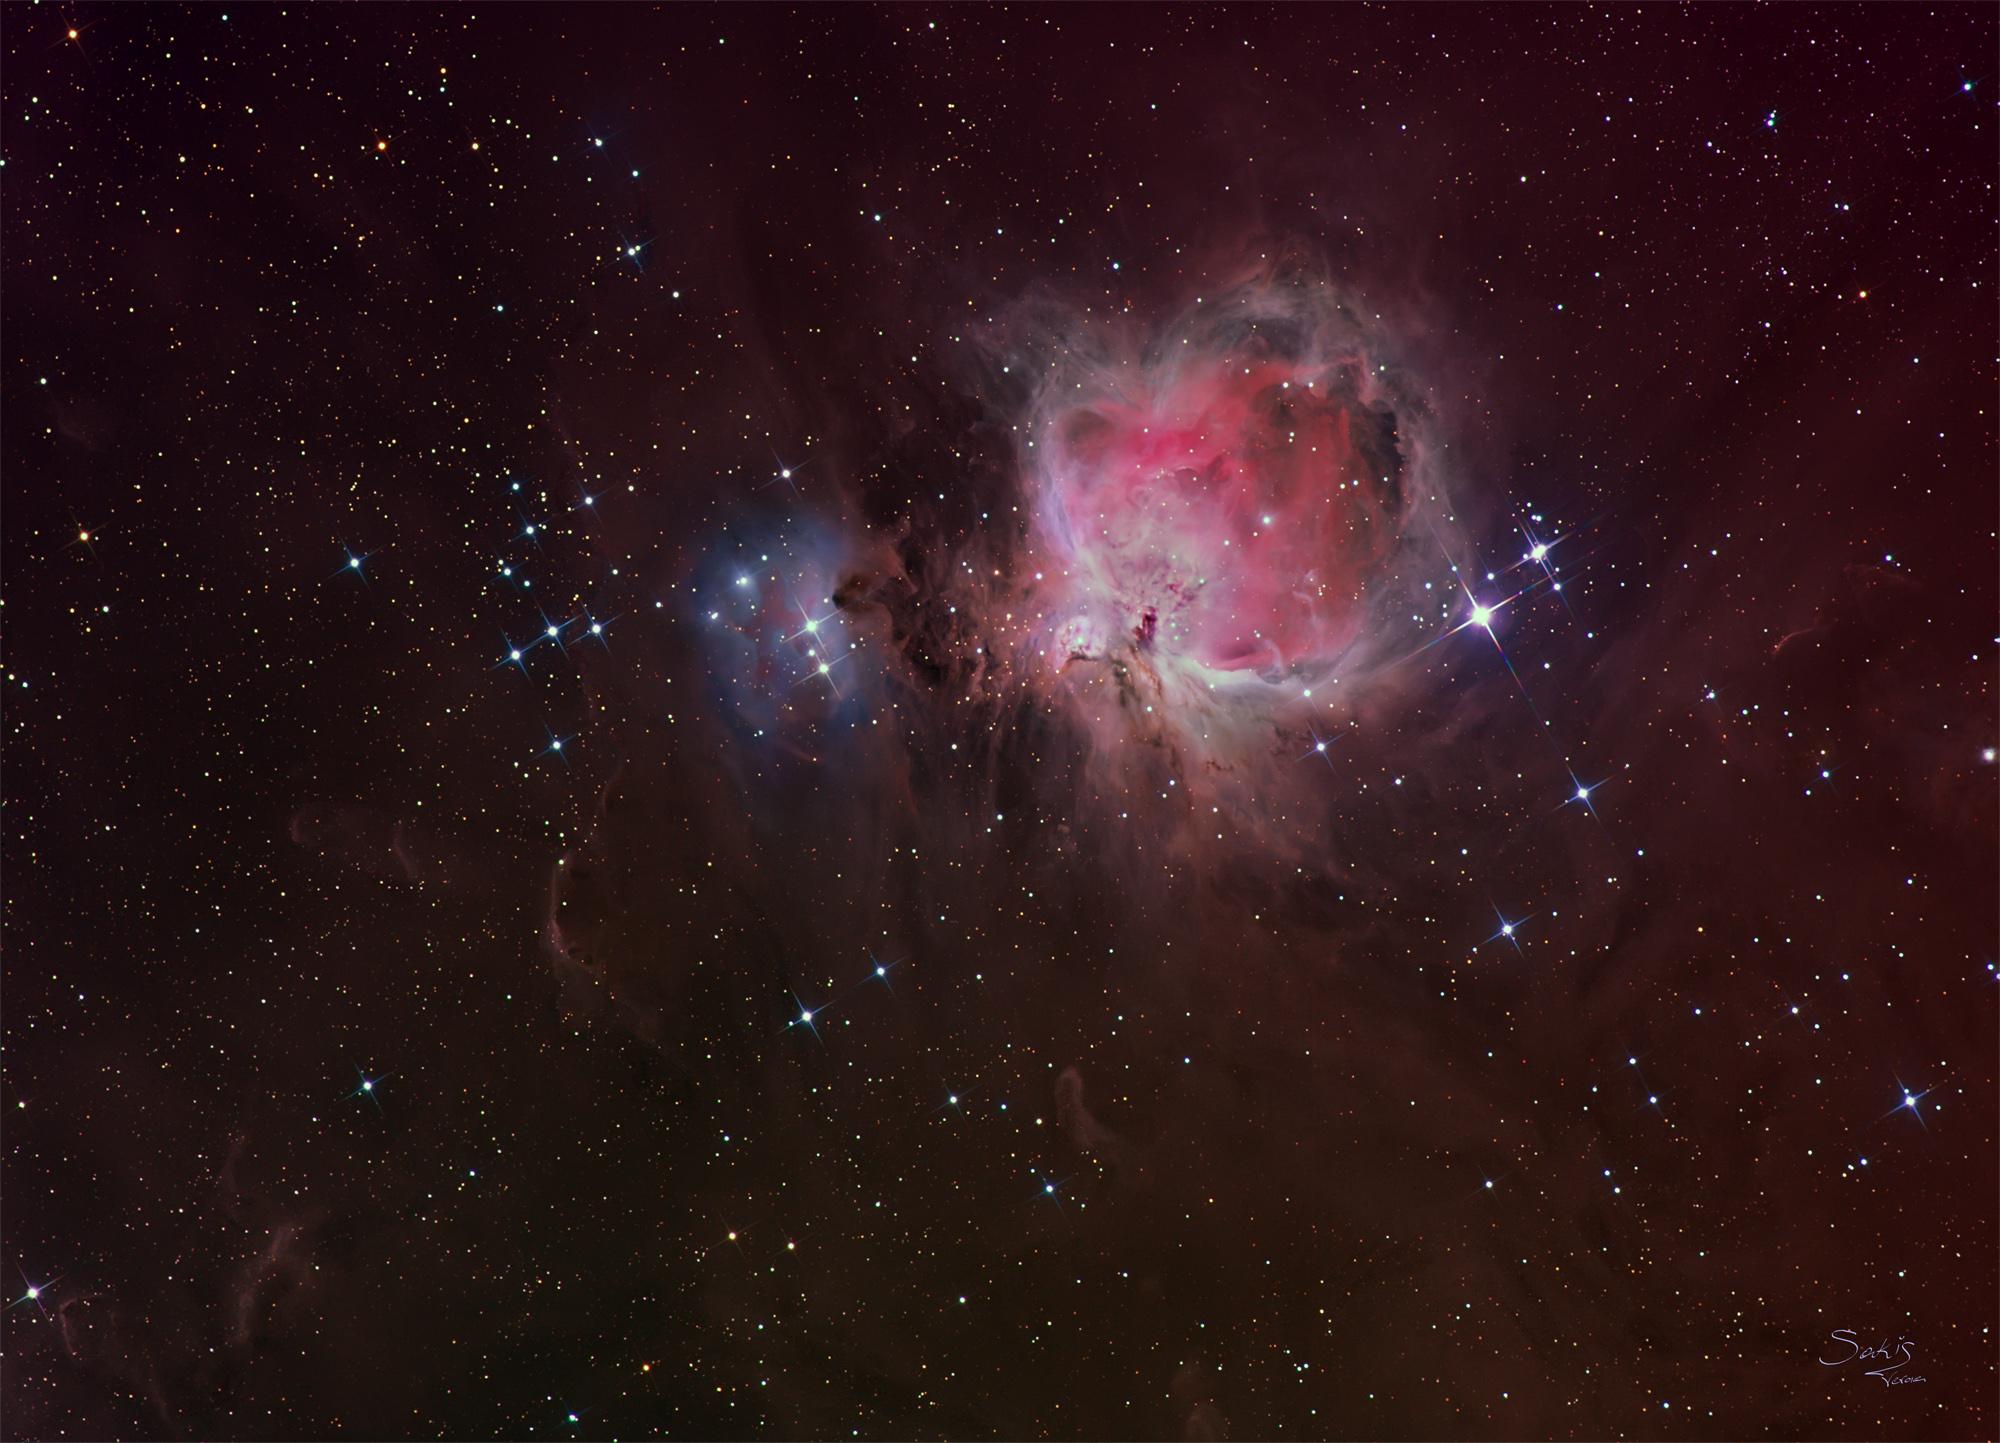 omega nebula 8 inch telescope - HD2000×1443